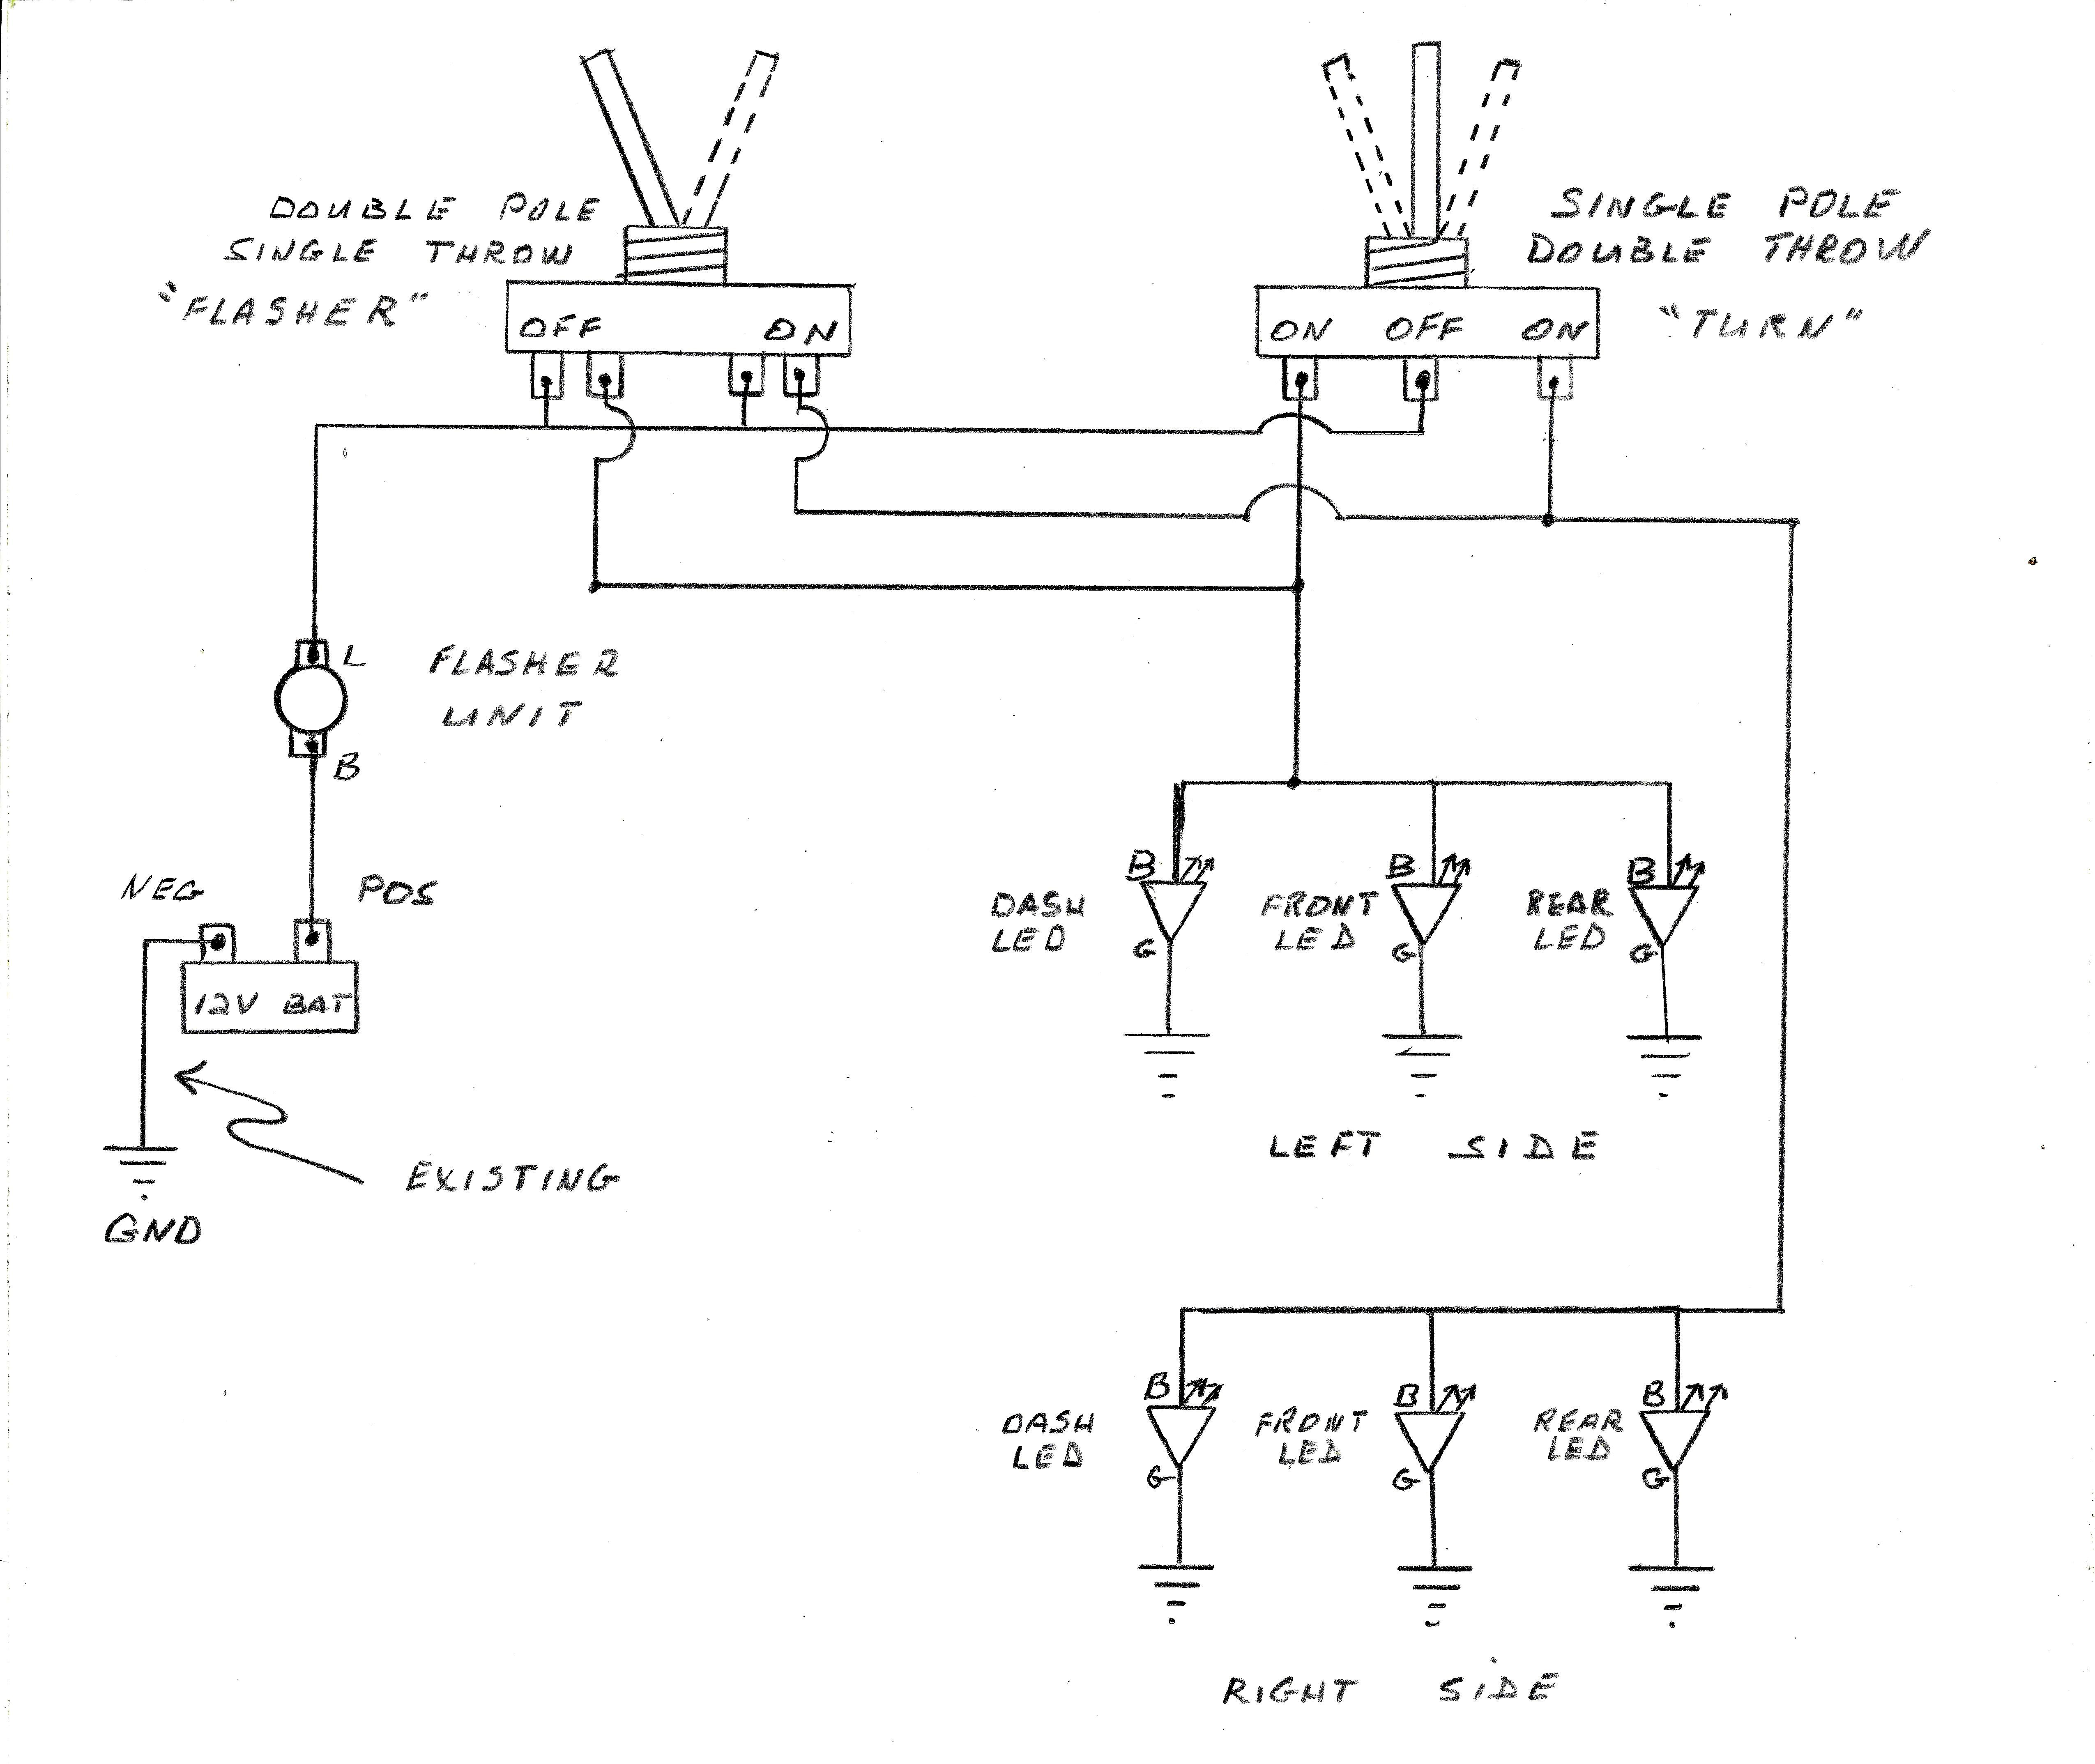 Universal Turn Signal Switch Wiring Diagram | Wiring Diagram - Universal Turn Signal Wiring Diagram